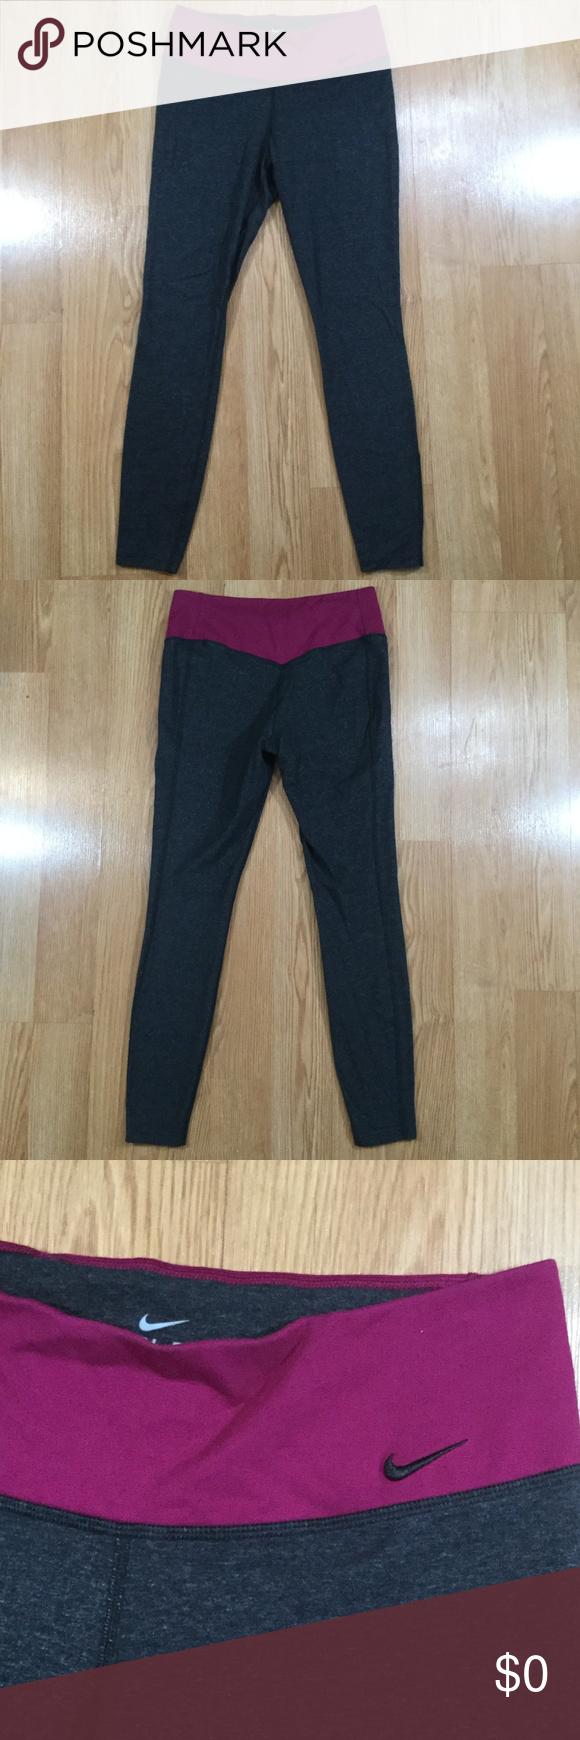 Nike Dri-Fit workout leggings gray and purple | Workout ...